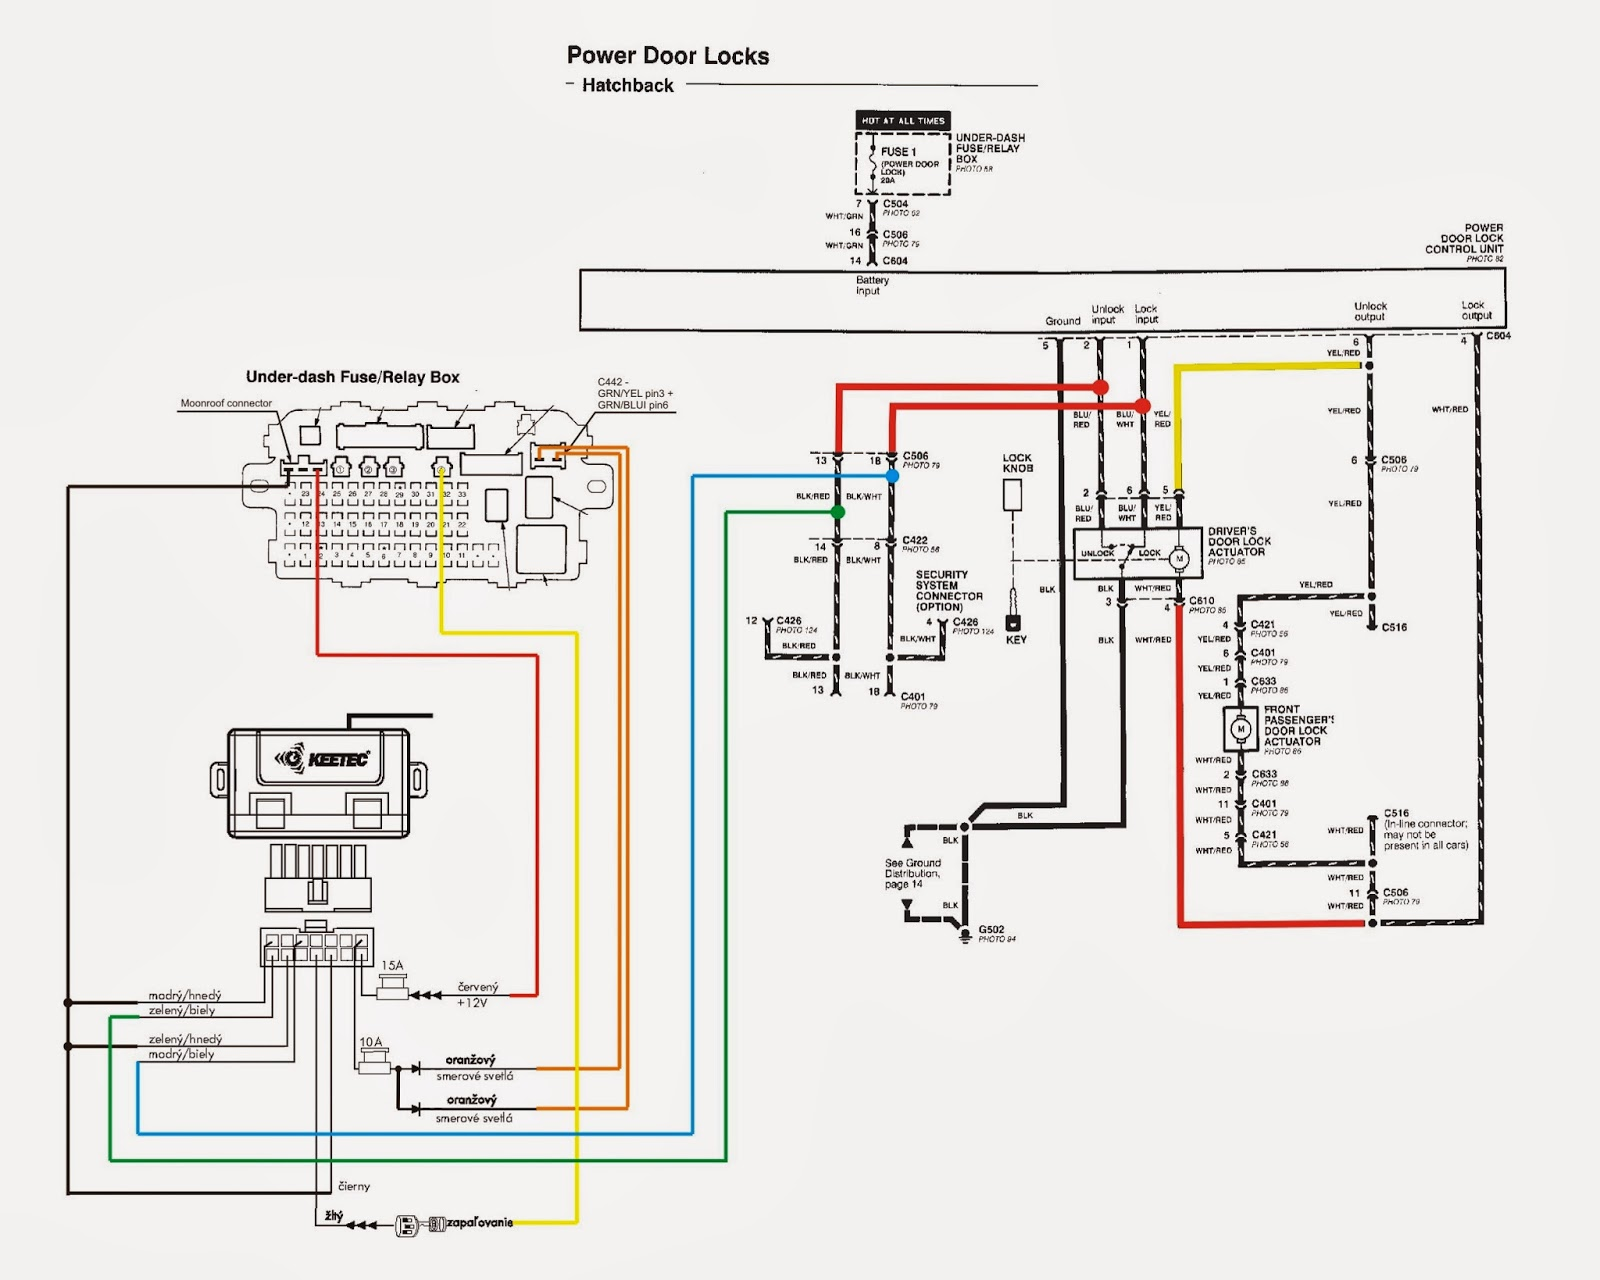 central lock wiring diagram universal [ 1600 x 1280 Pixel ]